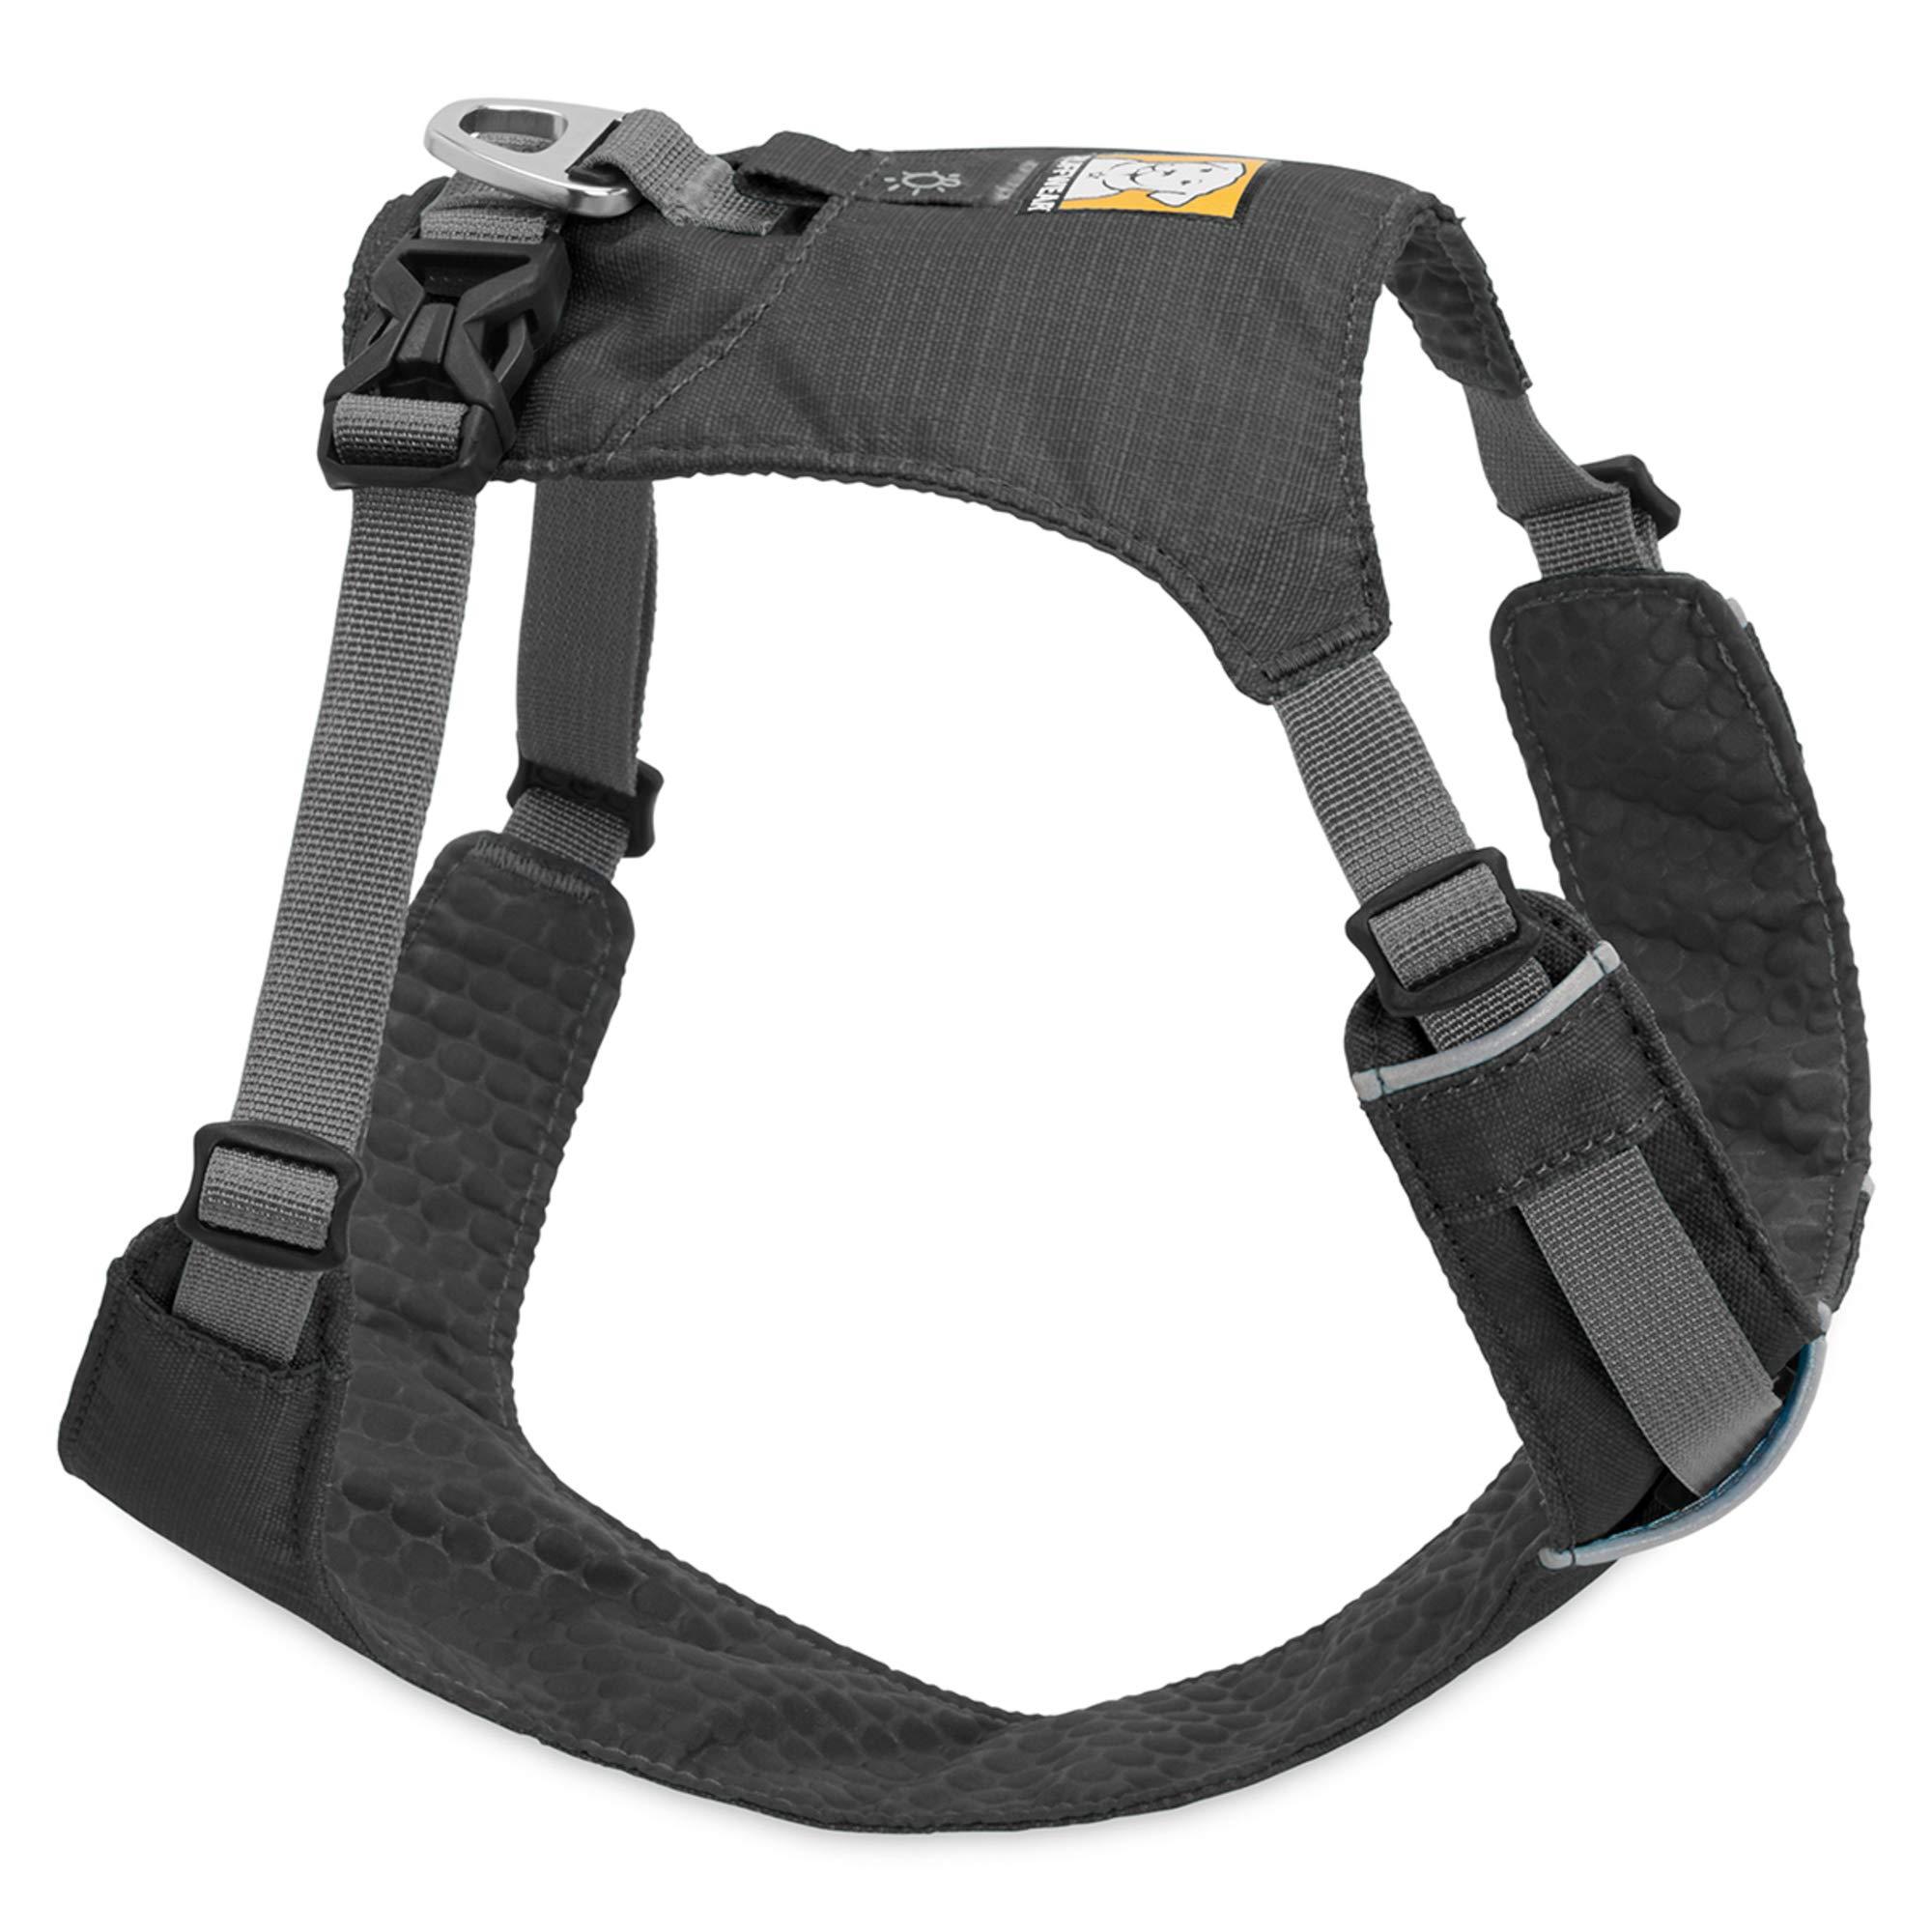 RUFFWEAR Lightweight Dog Harness, Medium Breeds, Adjustable Fit, Size: Medium, Twilight Grey, Hi & Light Harness, 3082-025M